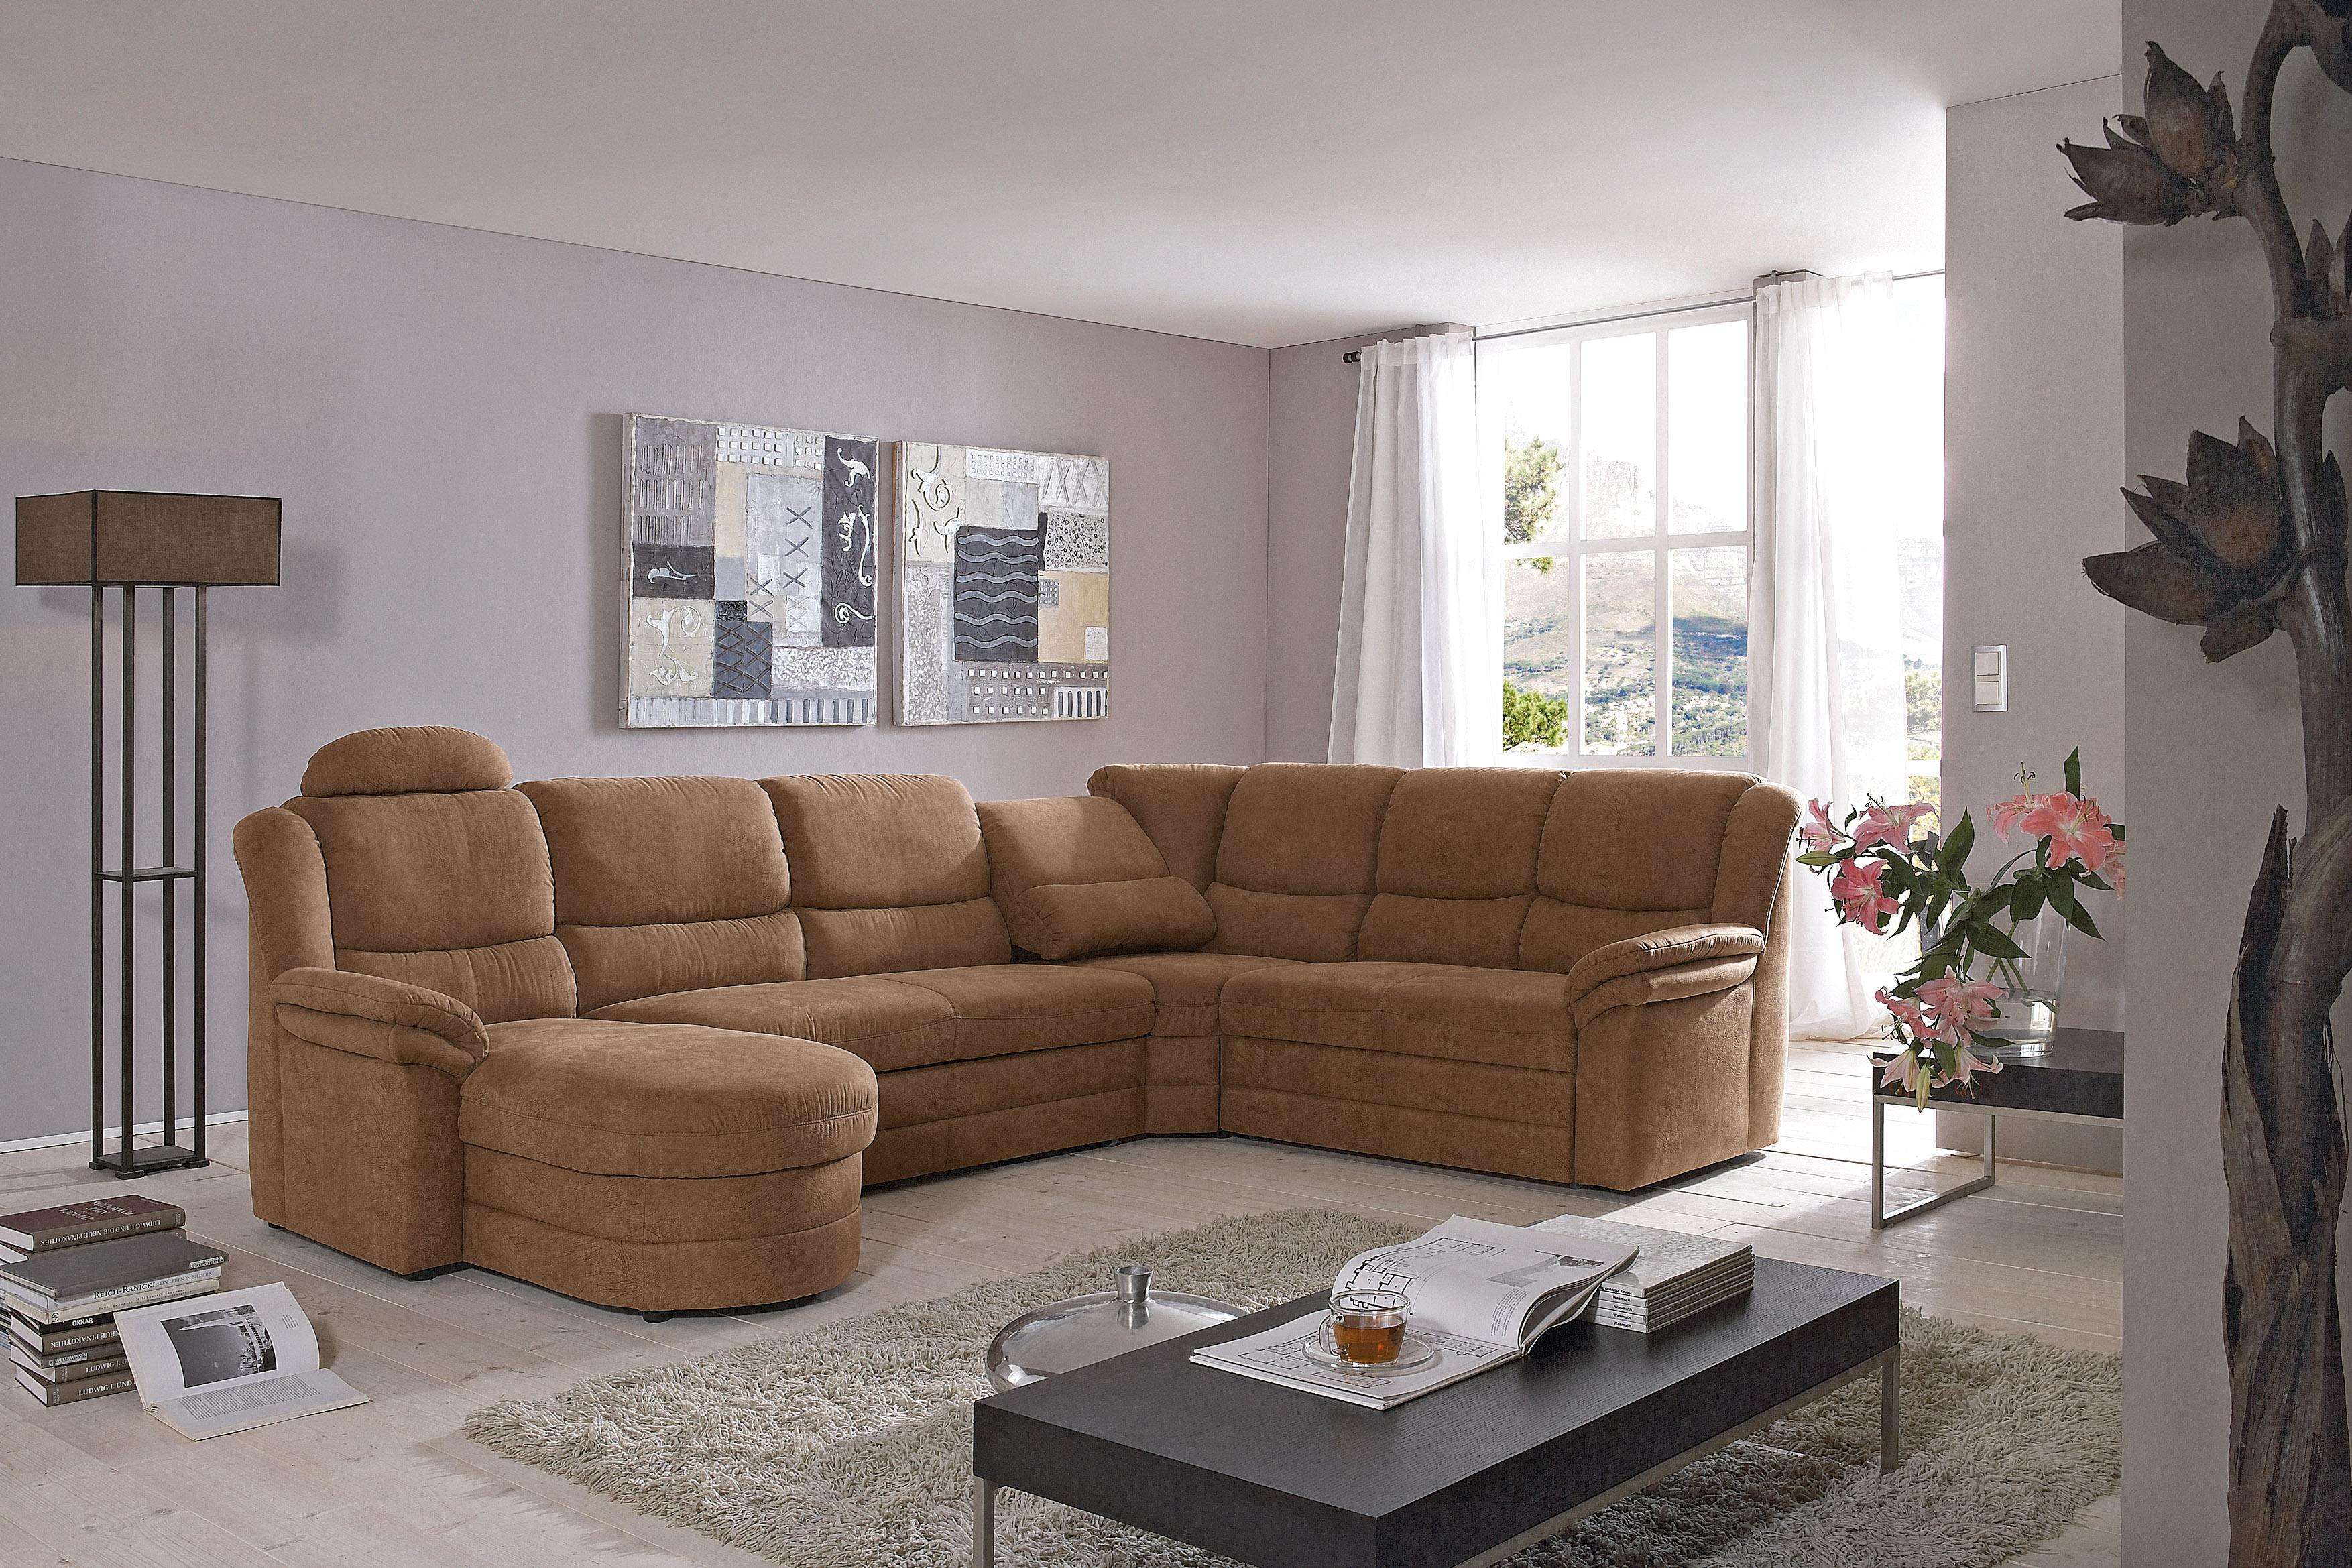 kentucky wohnlandschaft braun von polipol polsterm bel. Black Bedroom Furniture Sets. Home Design Ideas